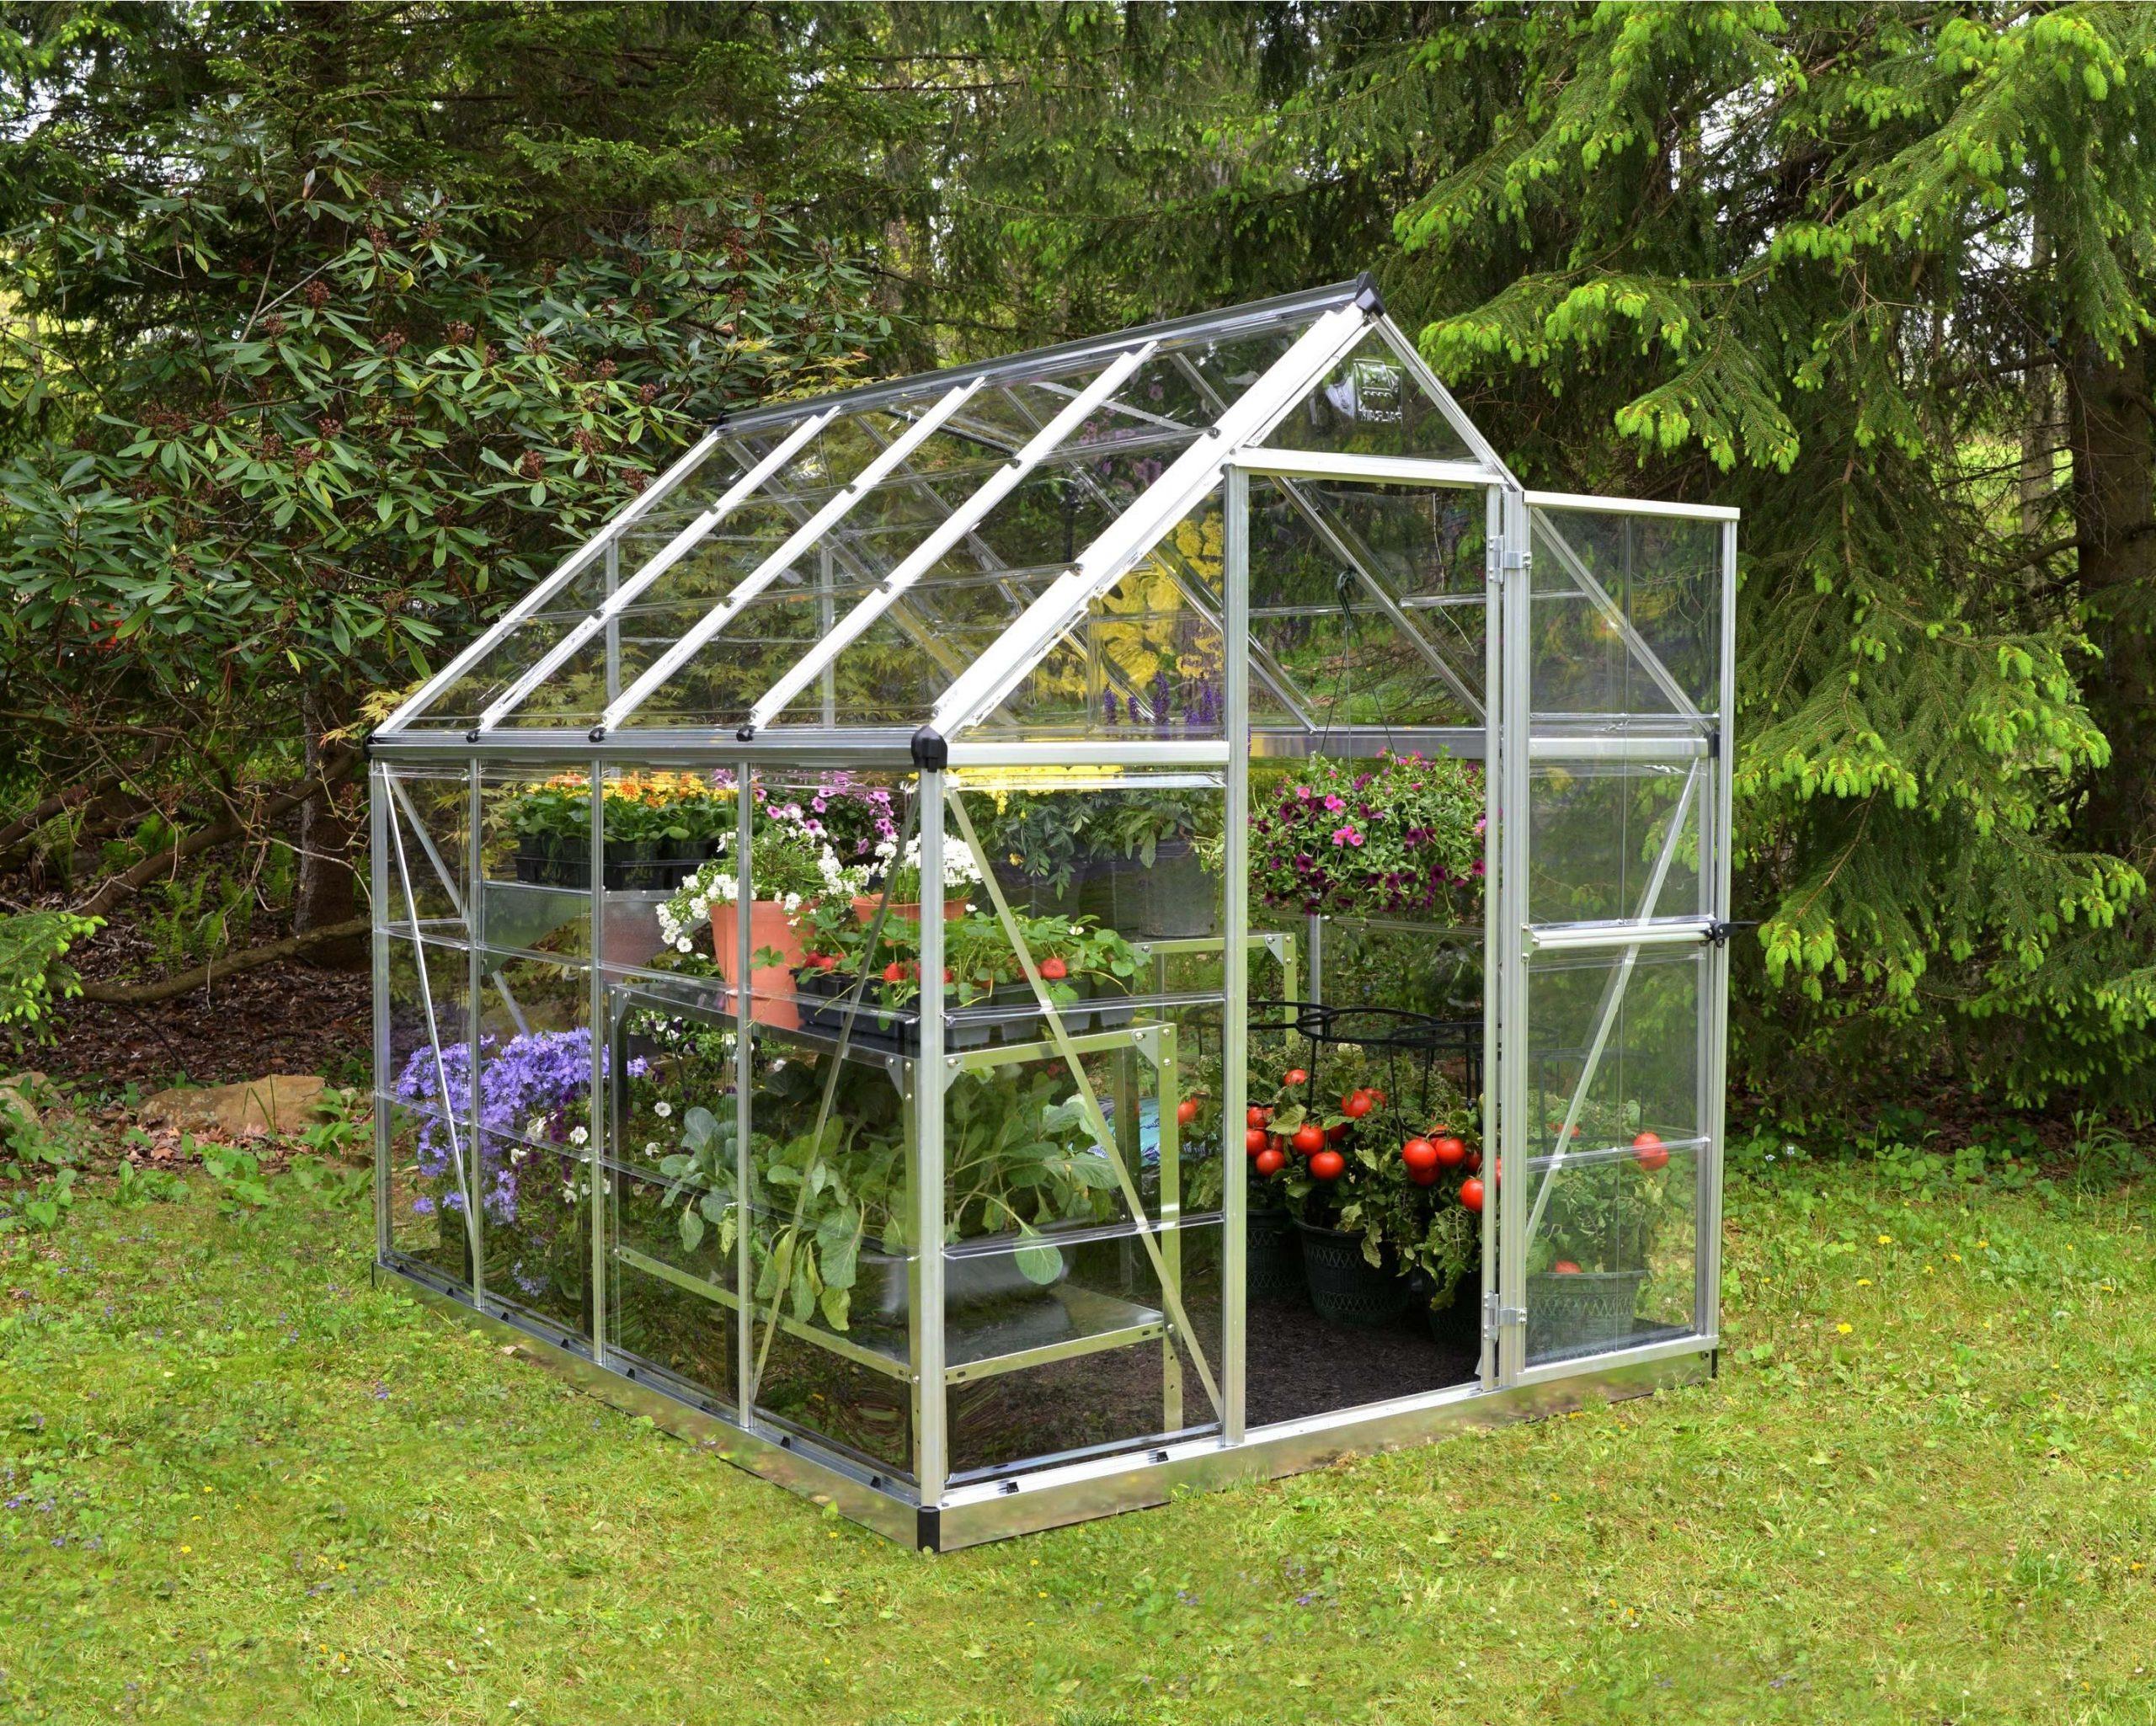 Serre De Jardin Argent Harmony 4.5 M², Aluminium Et ... avec Serre De Jardin Polycarbonate Pas Cher